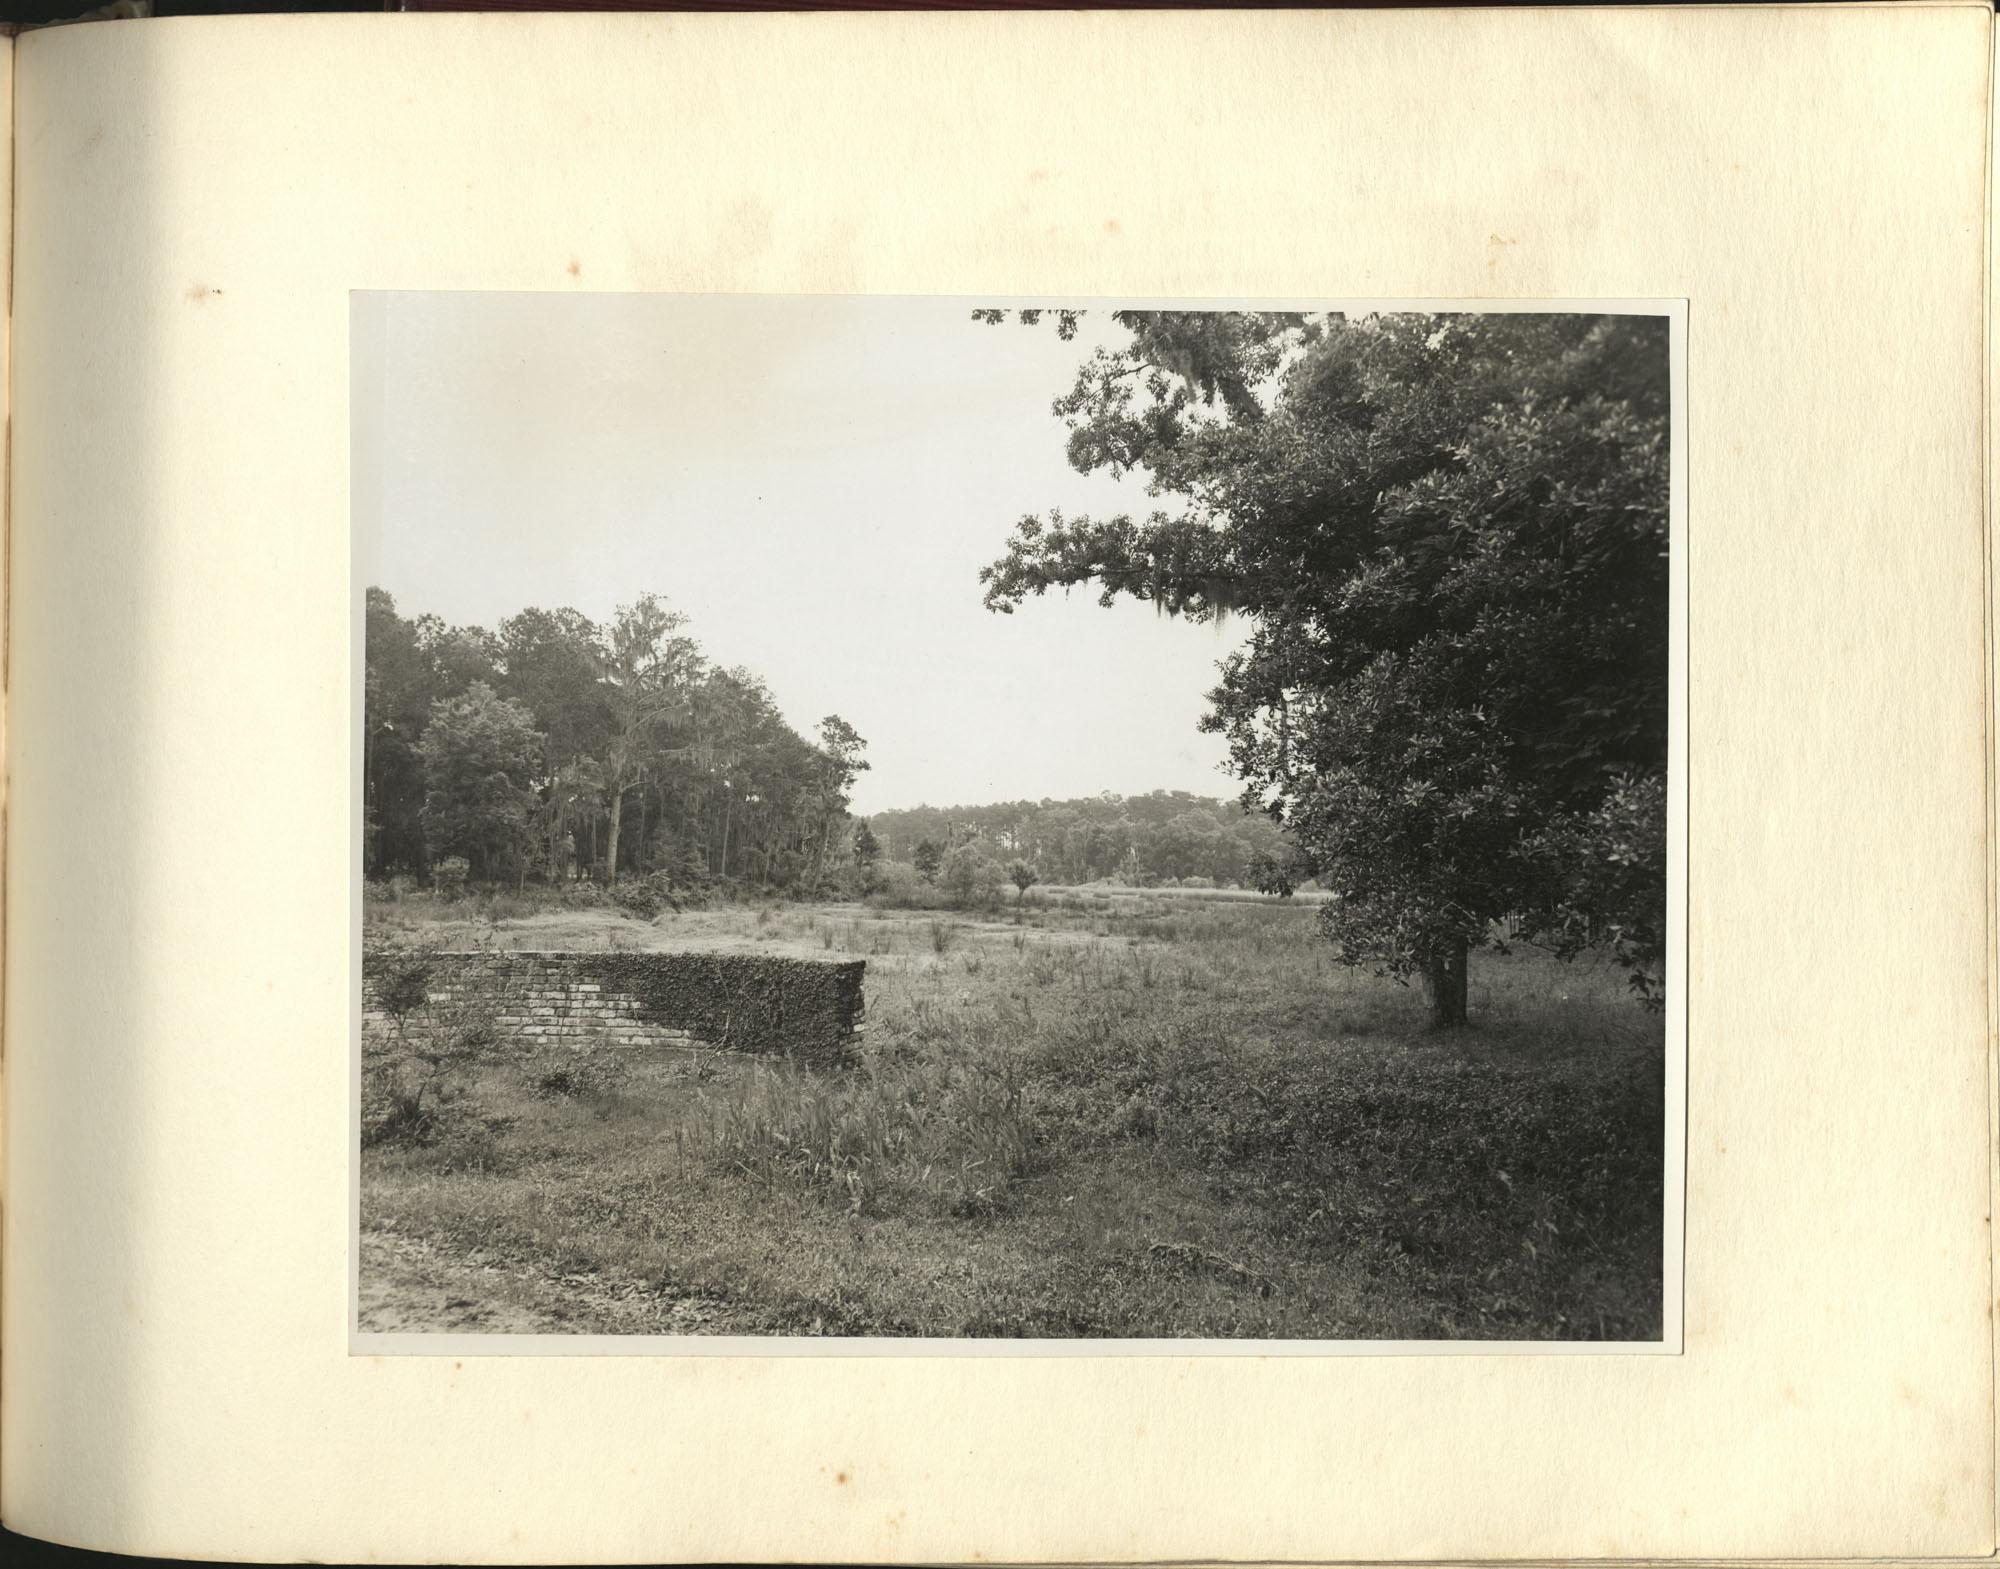 Medway Plantation Photograph Album, 1949, page 143